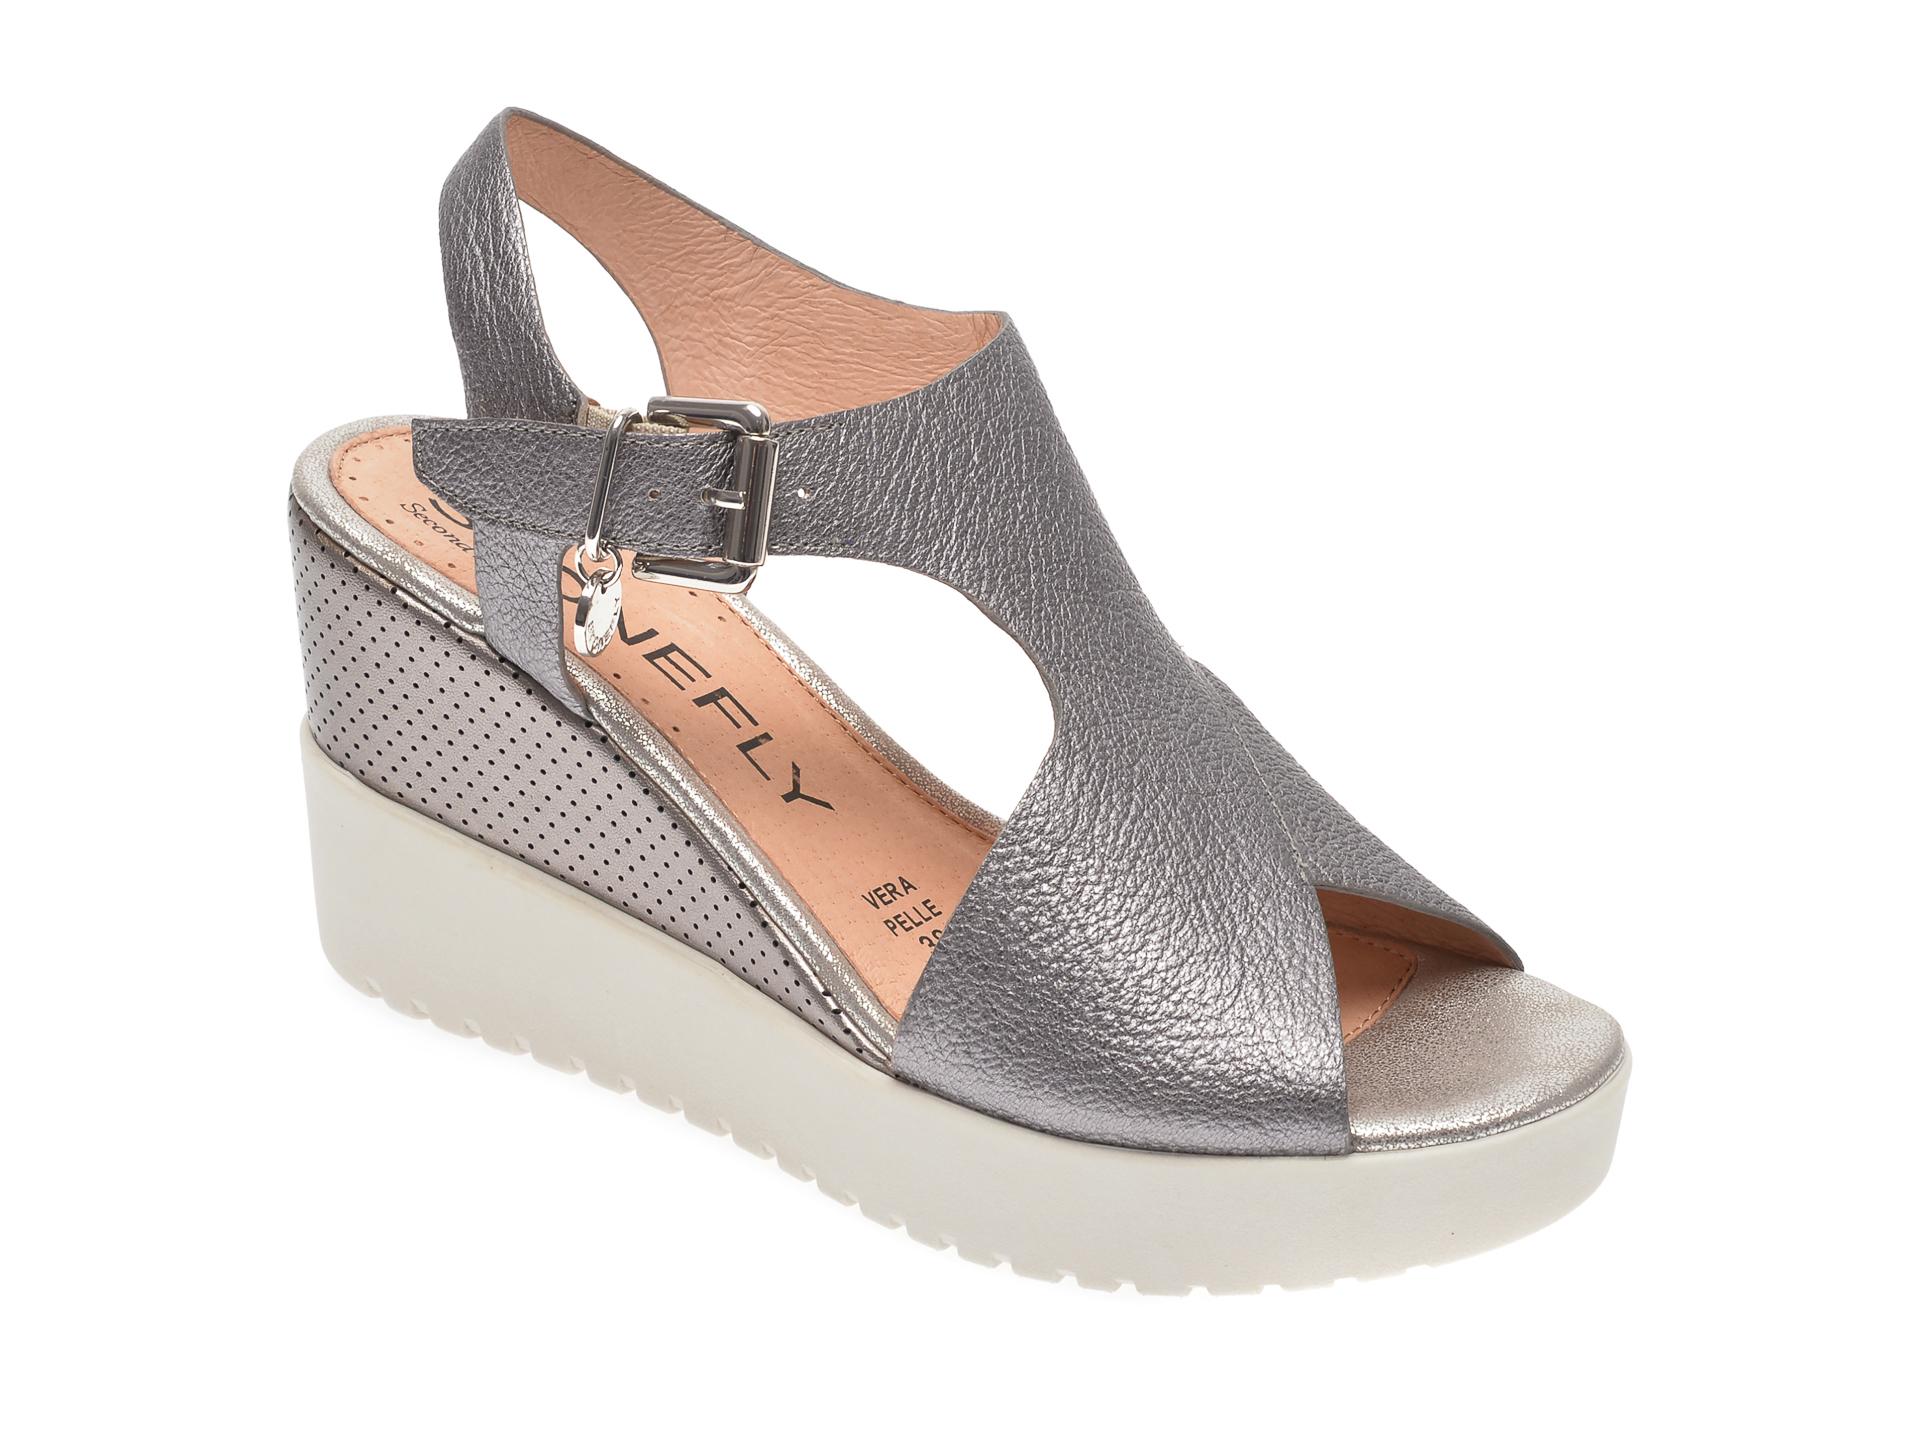 Sandale STONEFLY gri, ELY10, din piele naturala